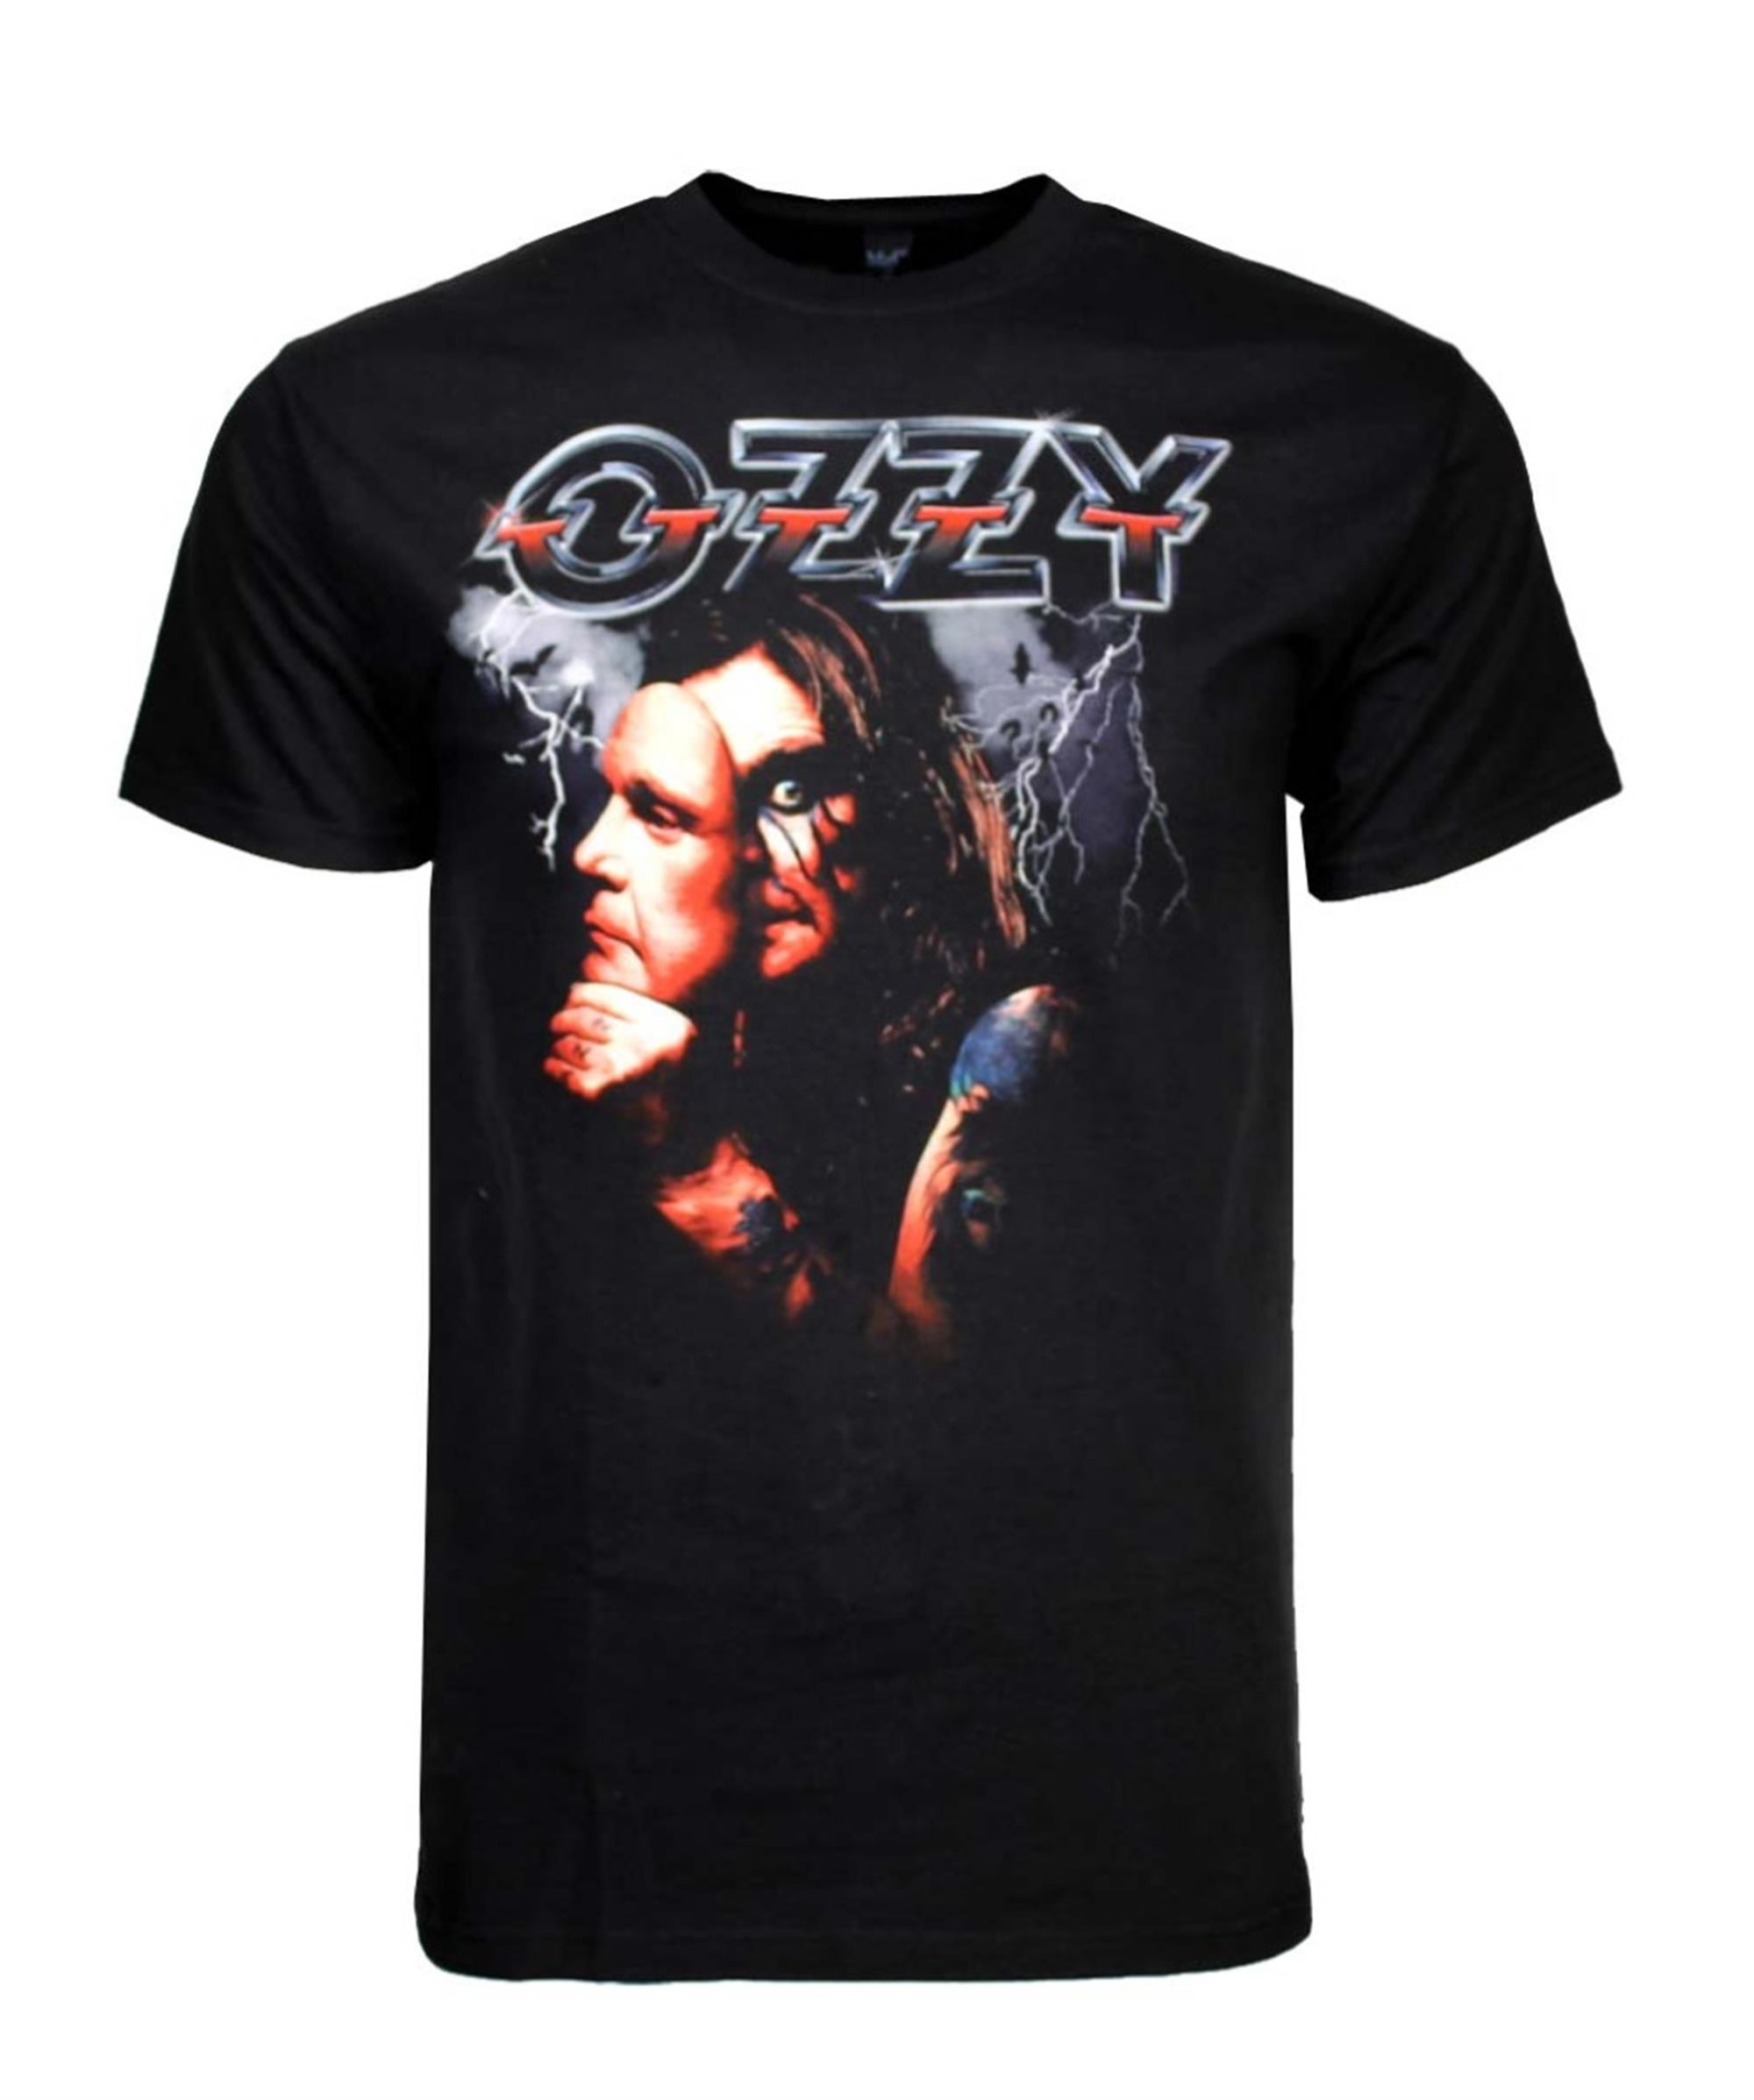 Ozzy Osbourne Mask T-Shirt